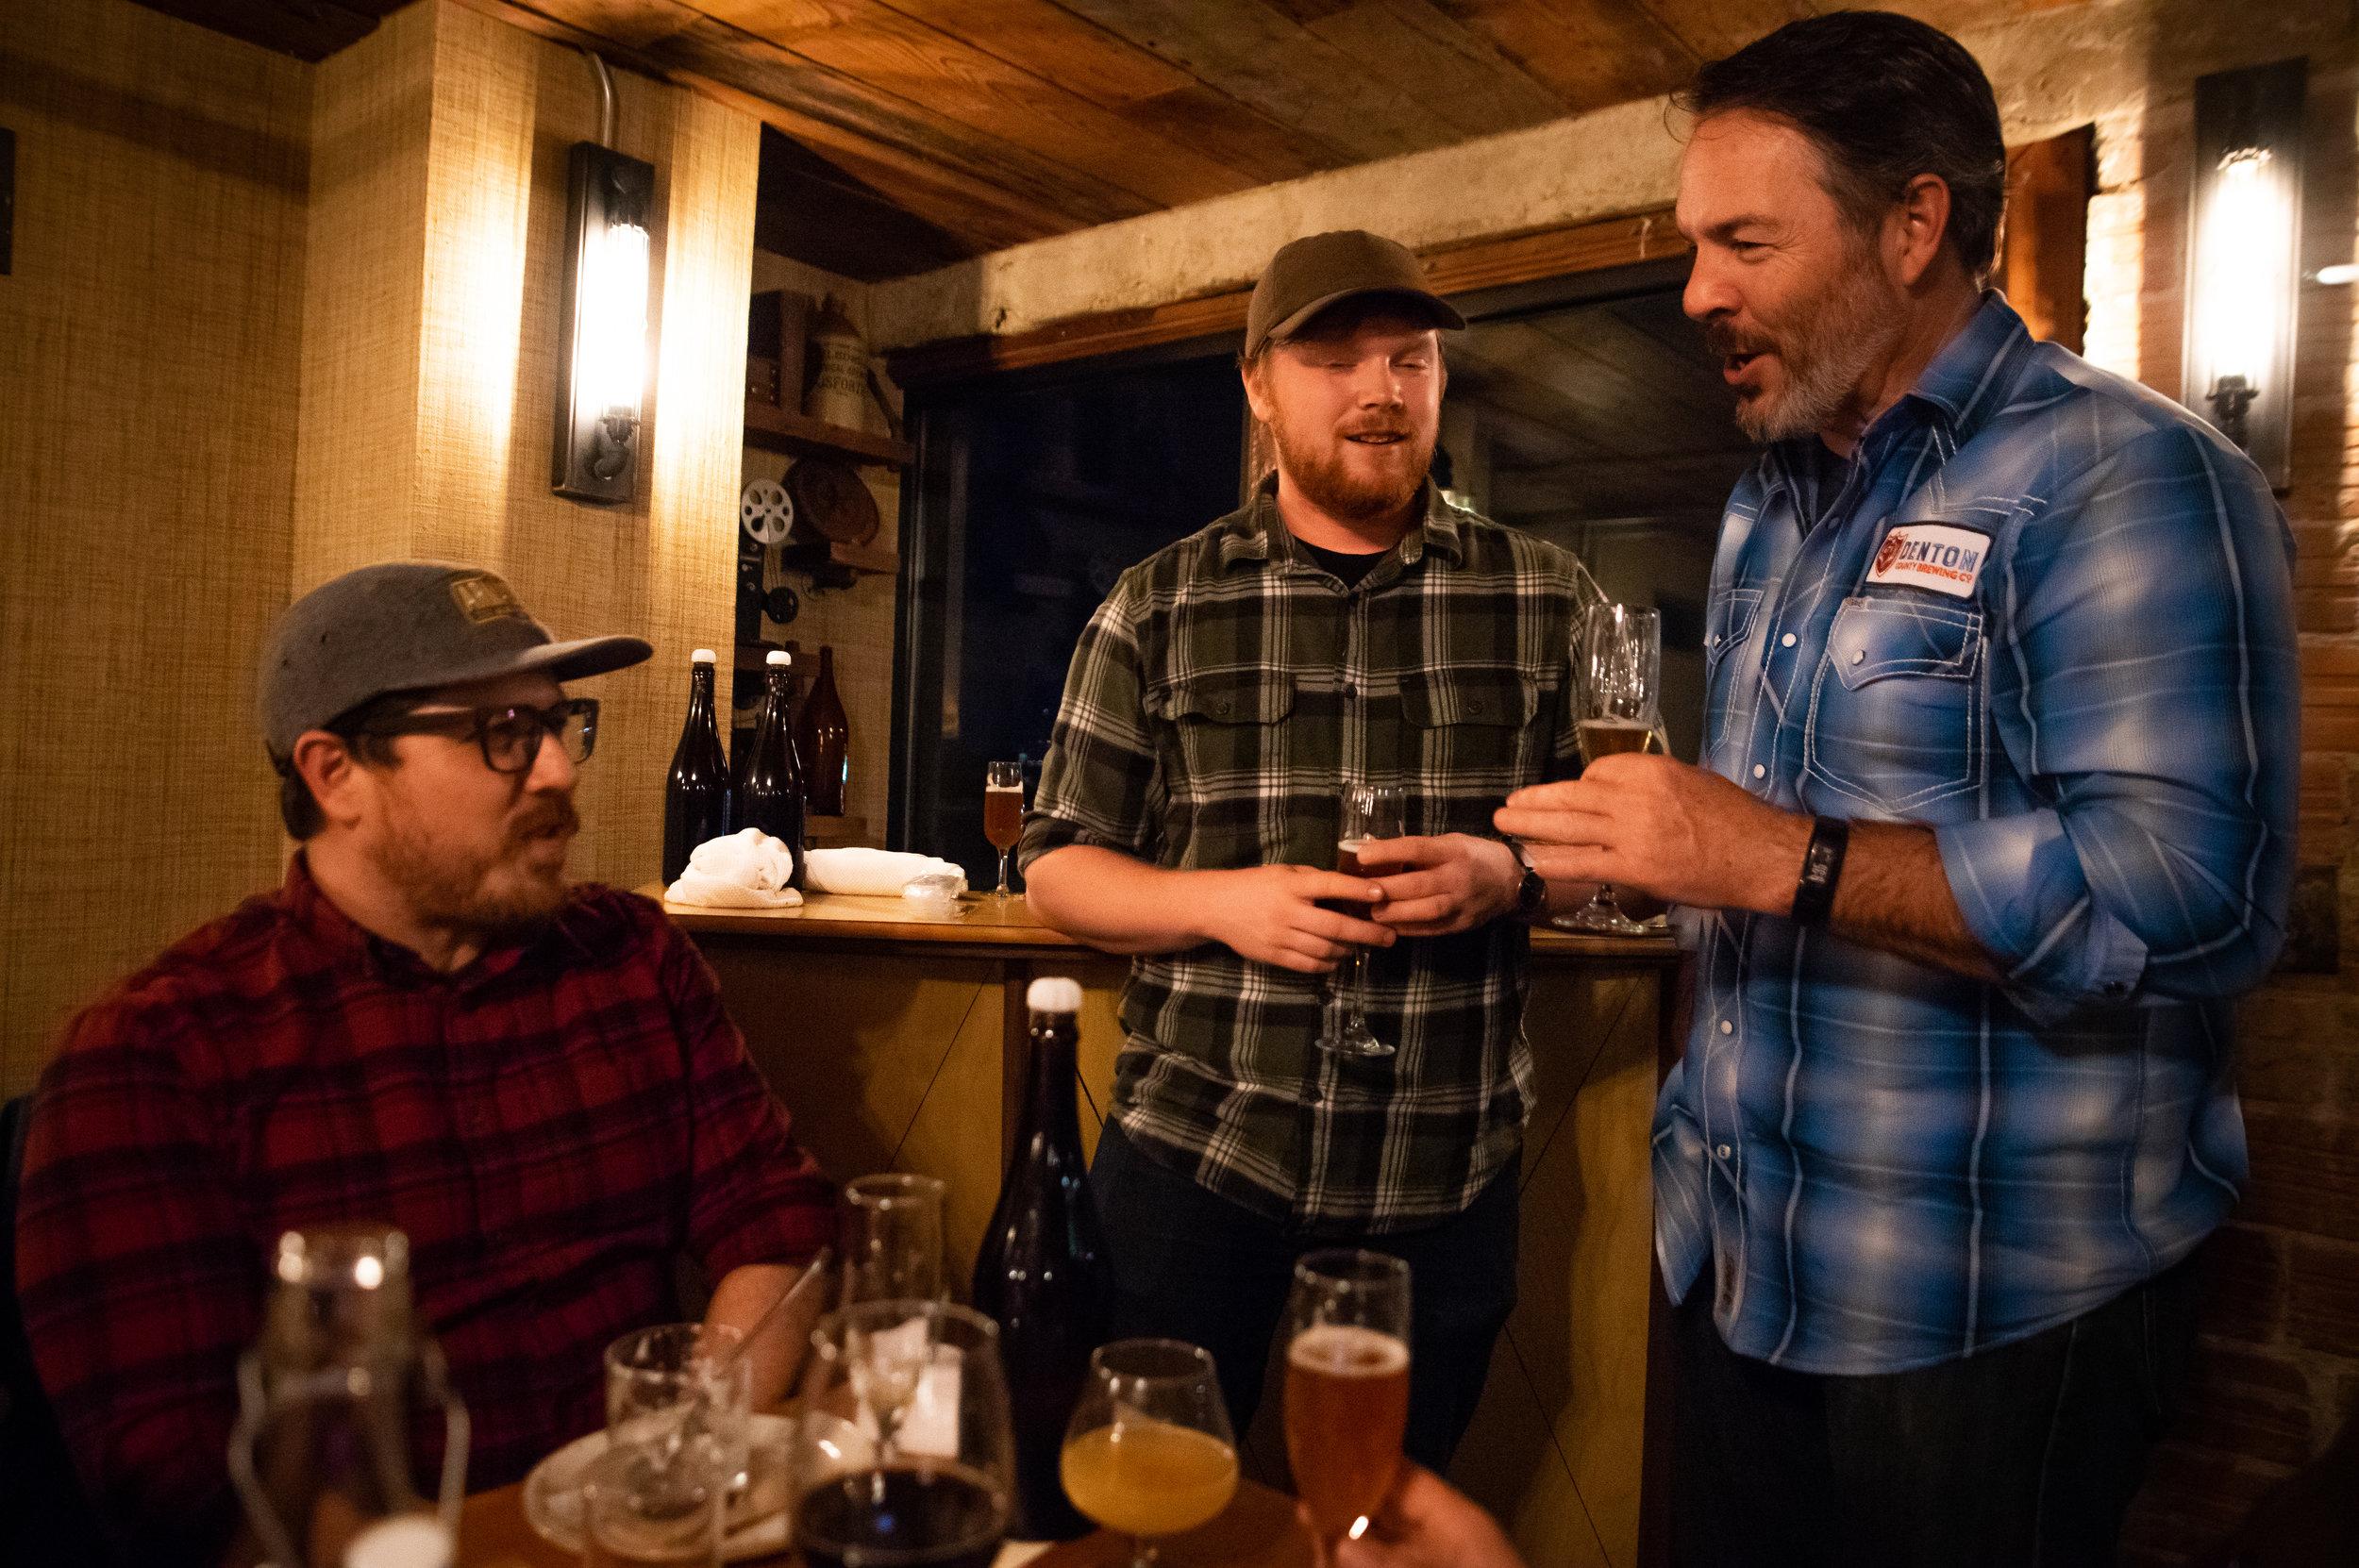 The Brewers Three: Bobby Mullins, Austin Ford, and Seth Morgan.